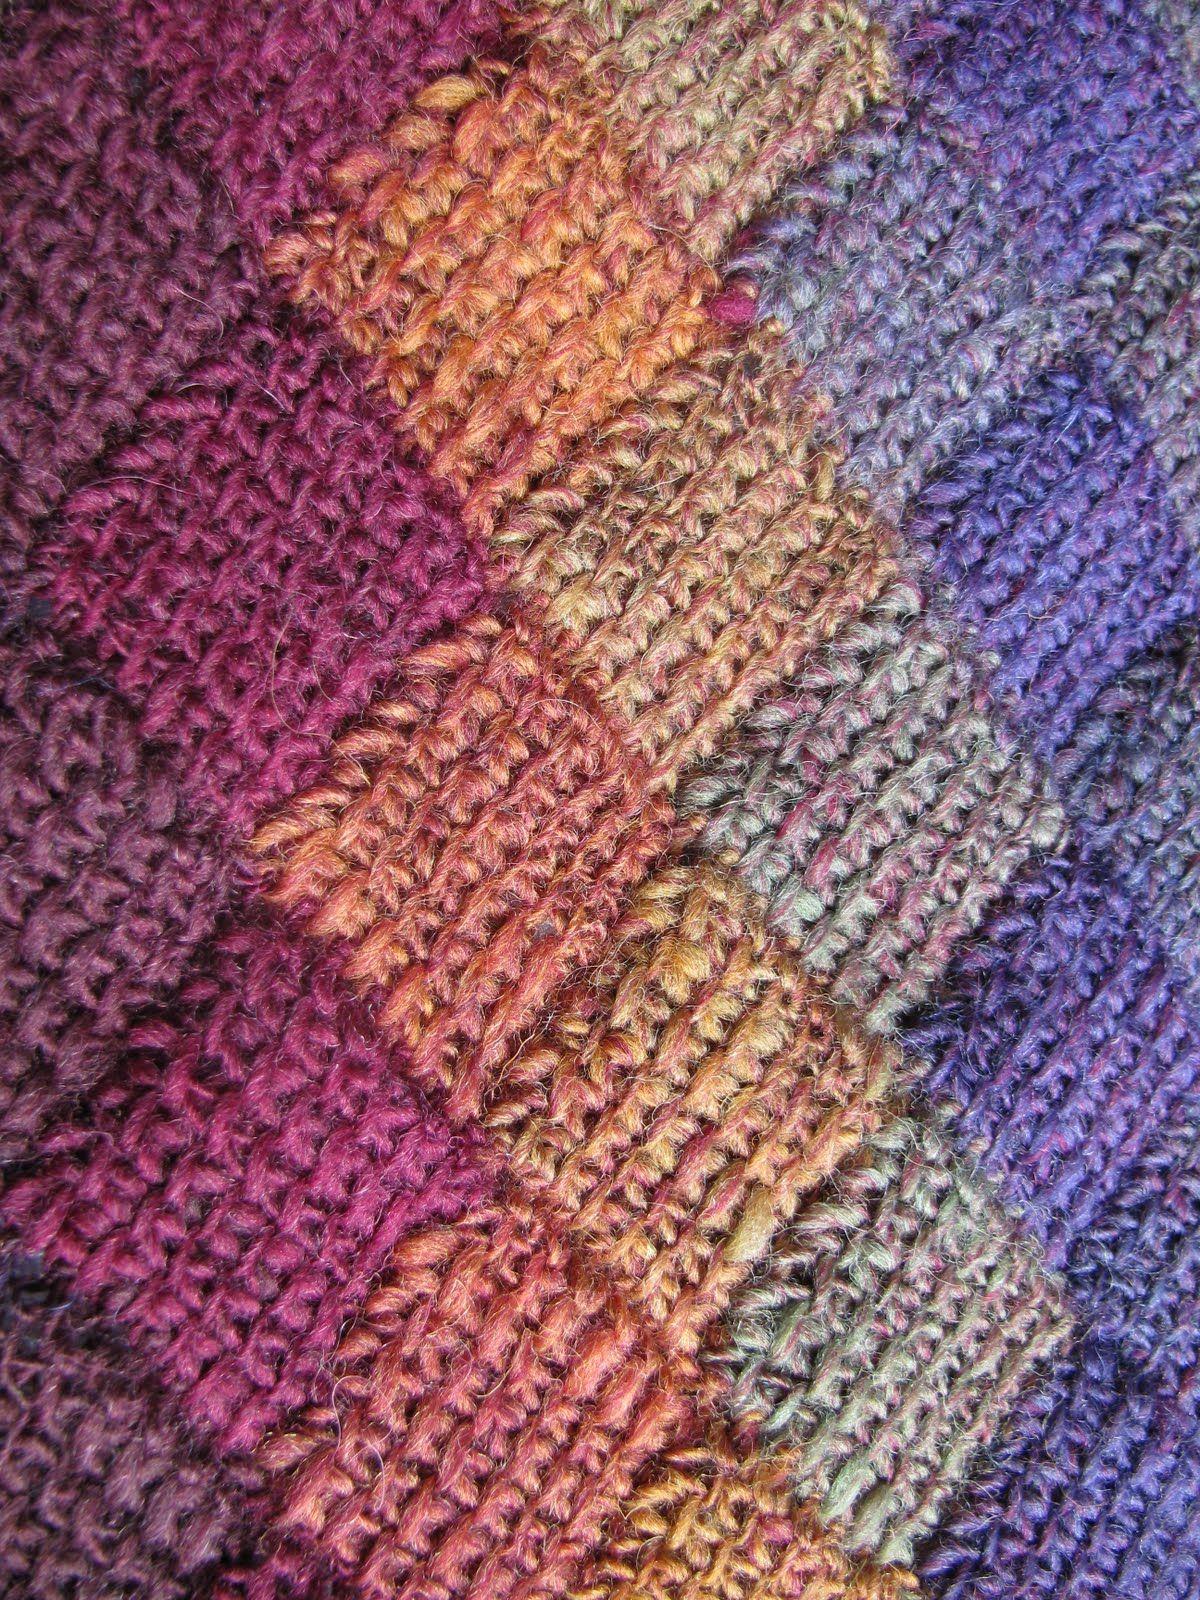 Tunisian Entrelac Crochet | crochet | Pinterest | Tunesisch häkeln ...